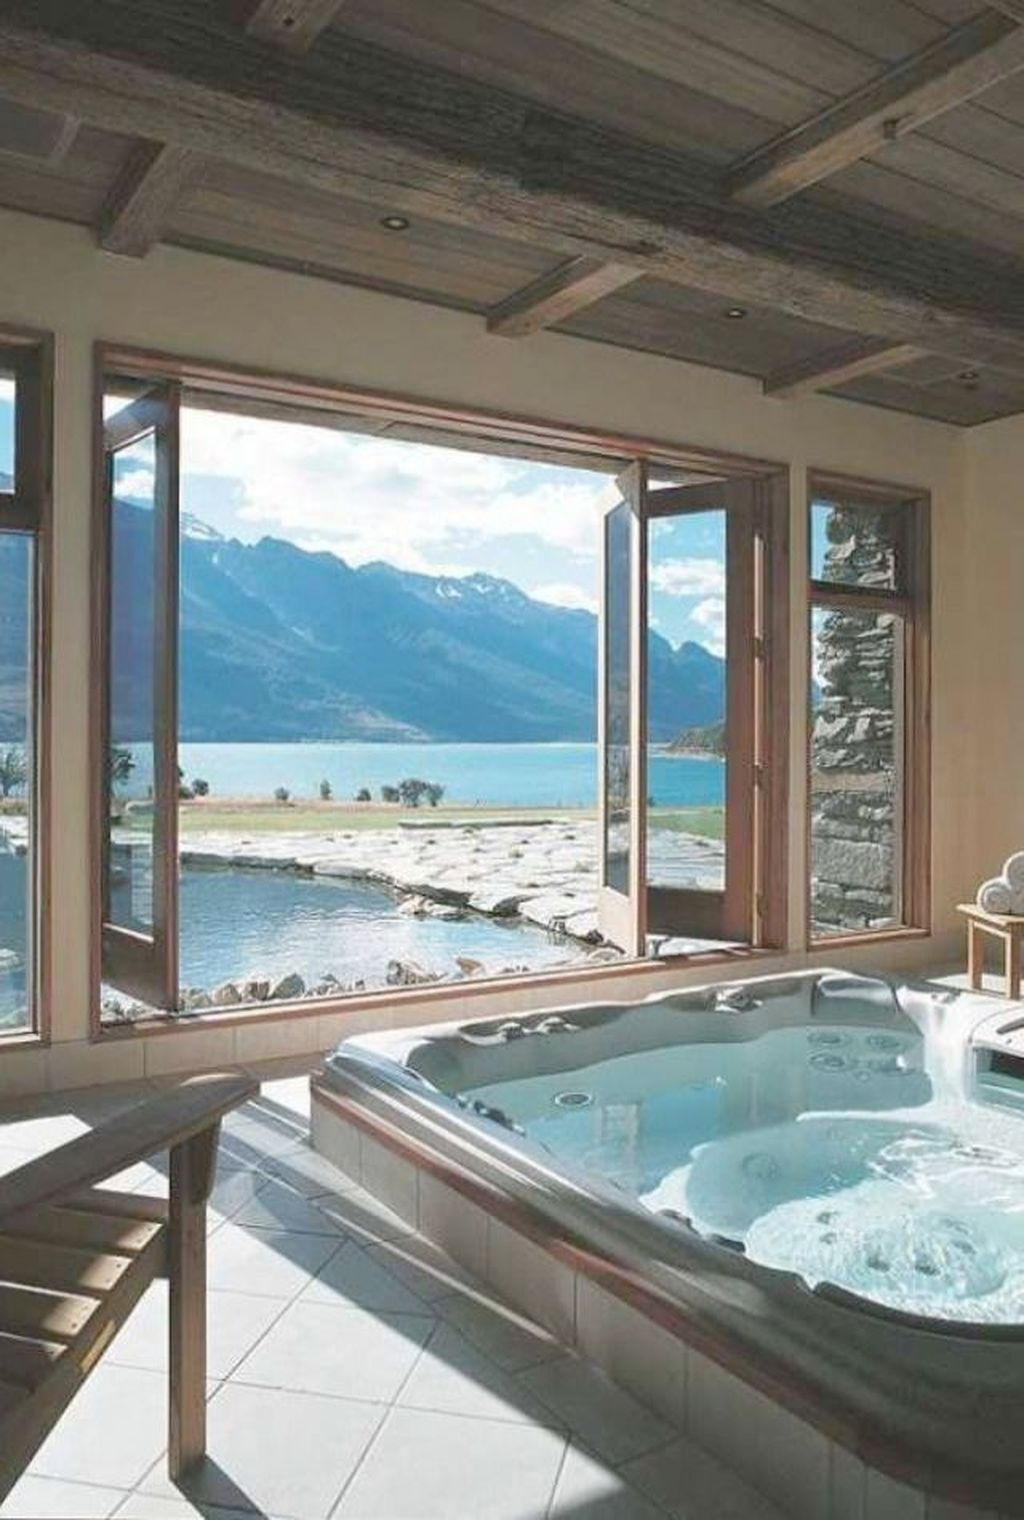 Badezimmer ideen whirlpool  lovely elegant spa bathroom ideas  wohnideen  pinterest